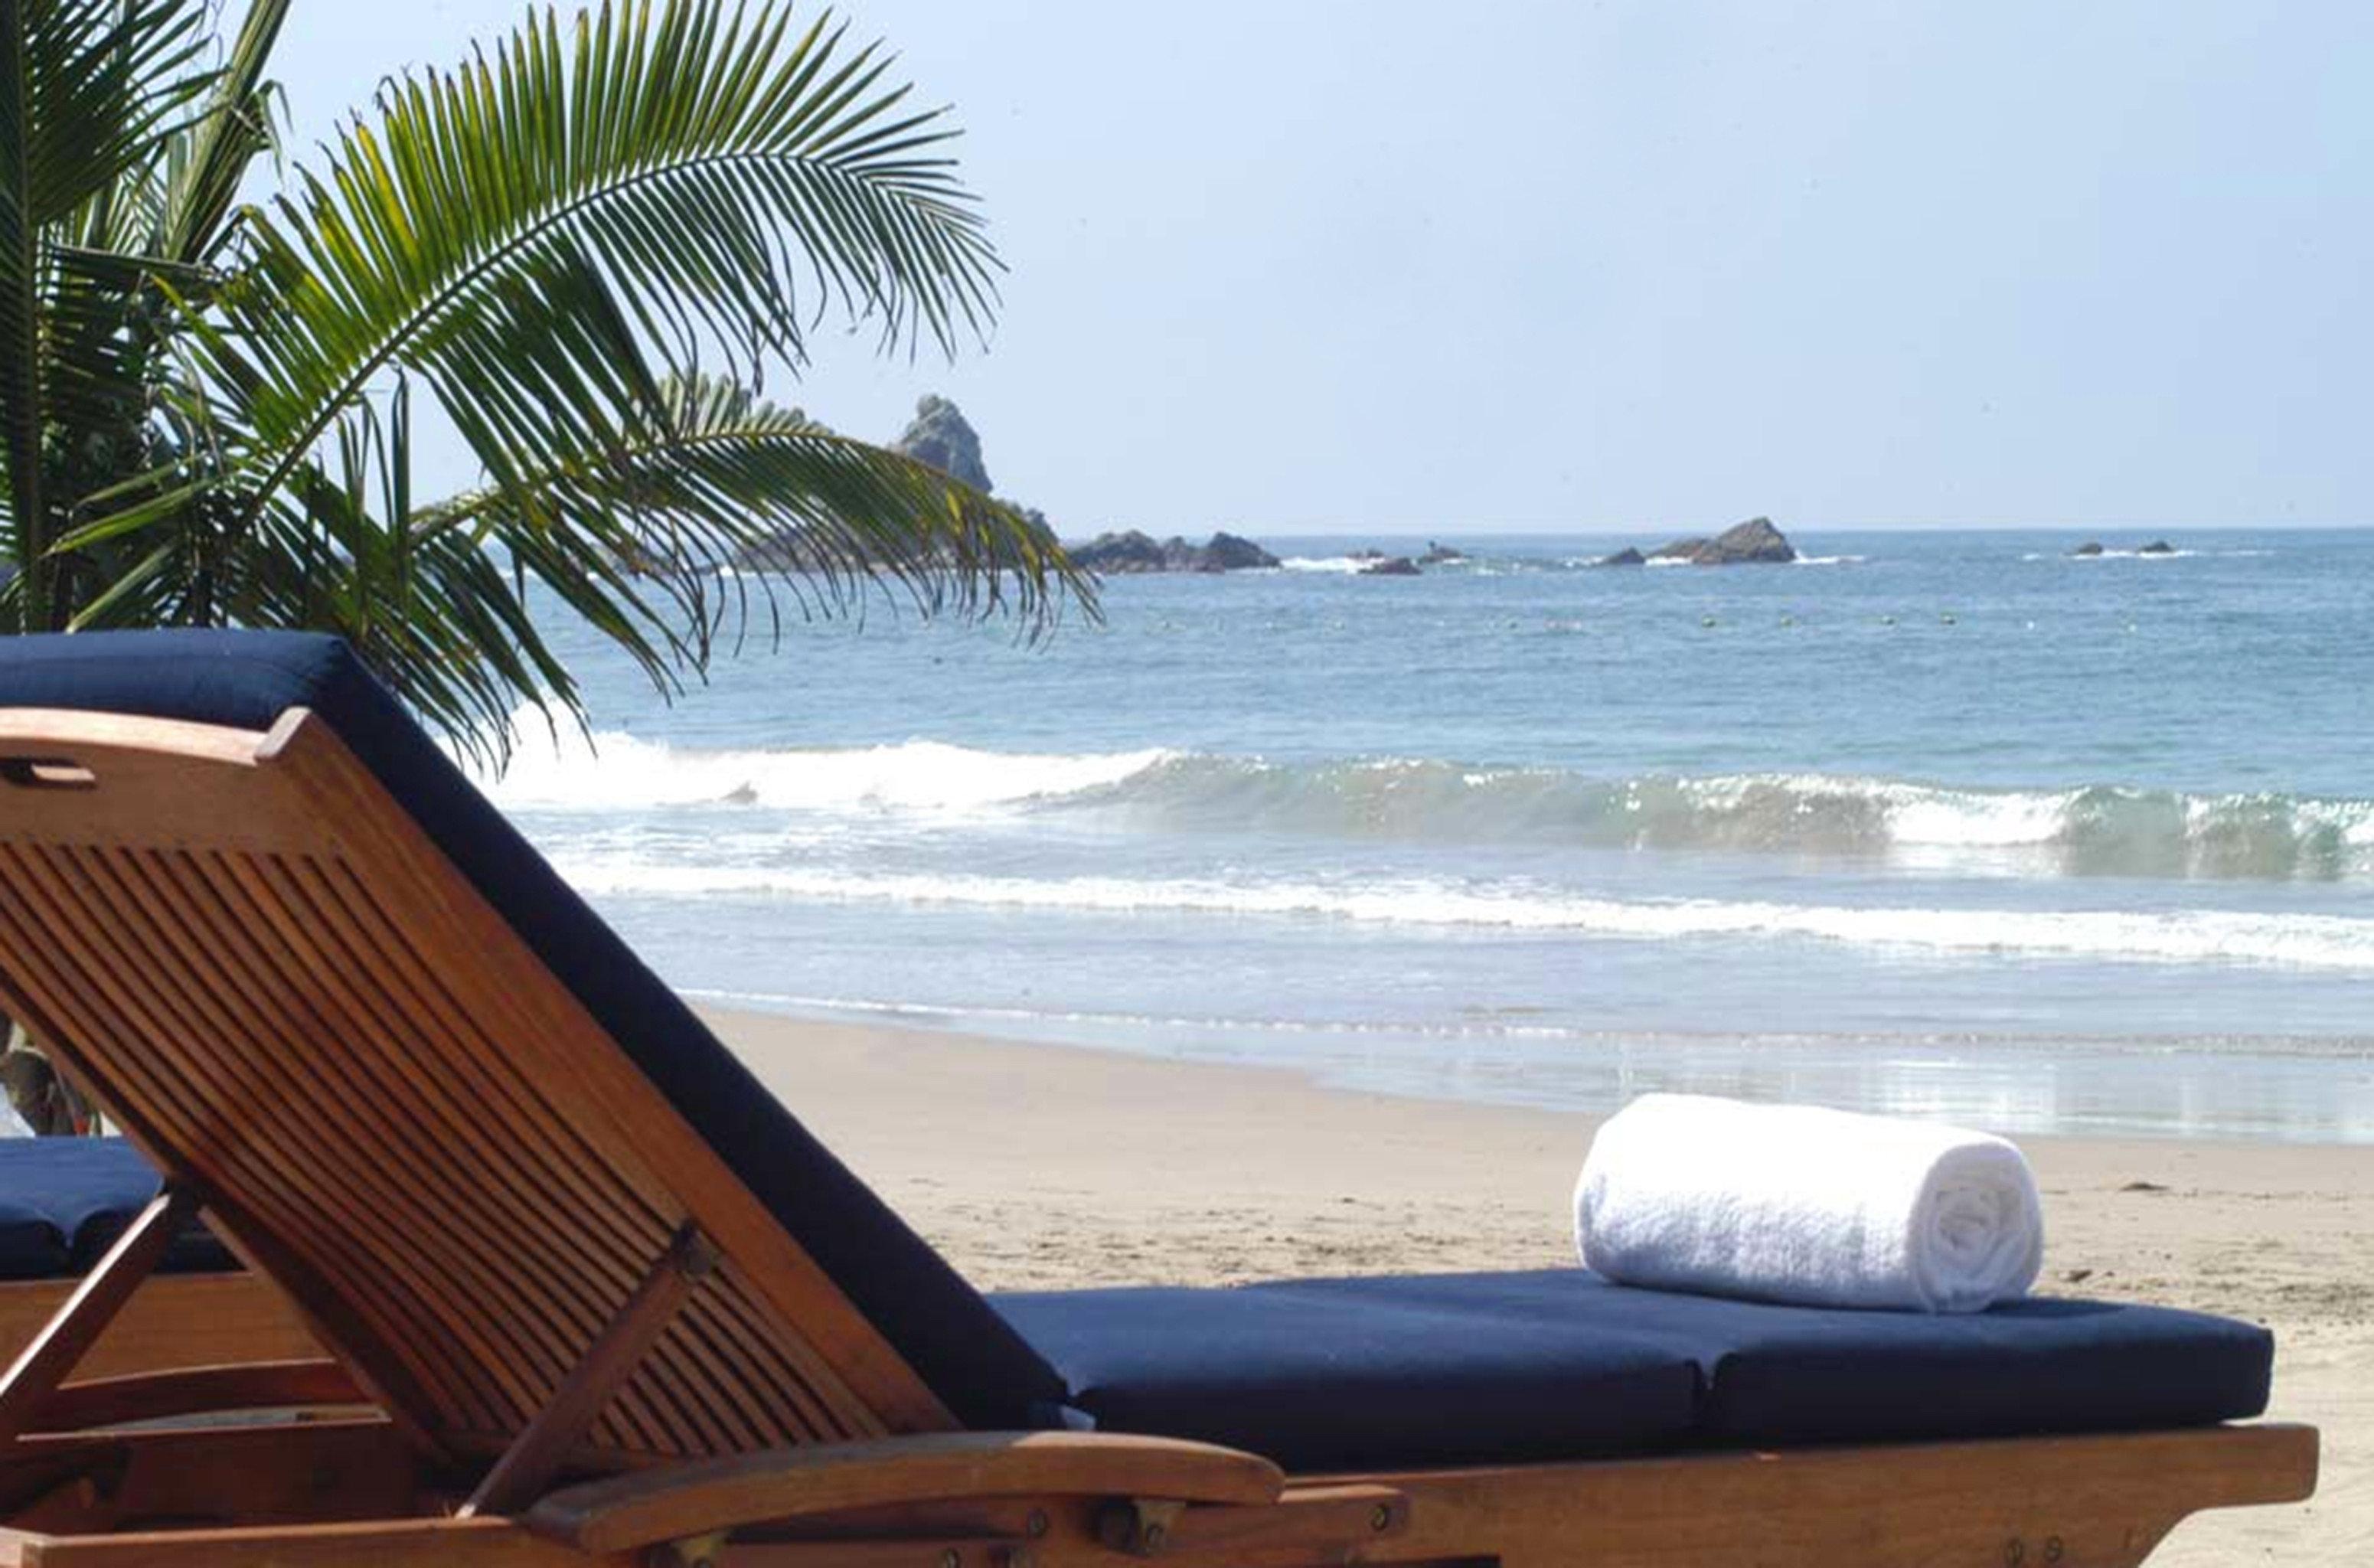 Beach Beachfront Ocean Resort Tropical Waterfront sky leisure property shore Sea Coast